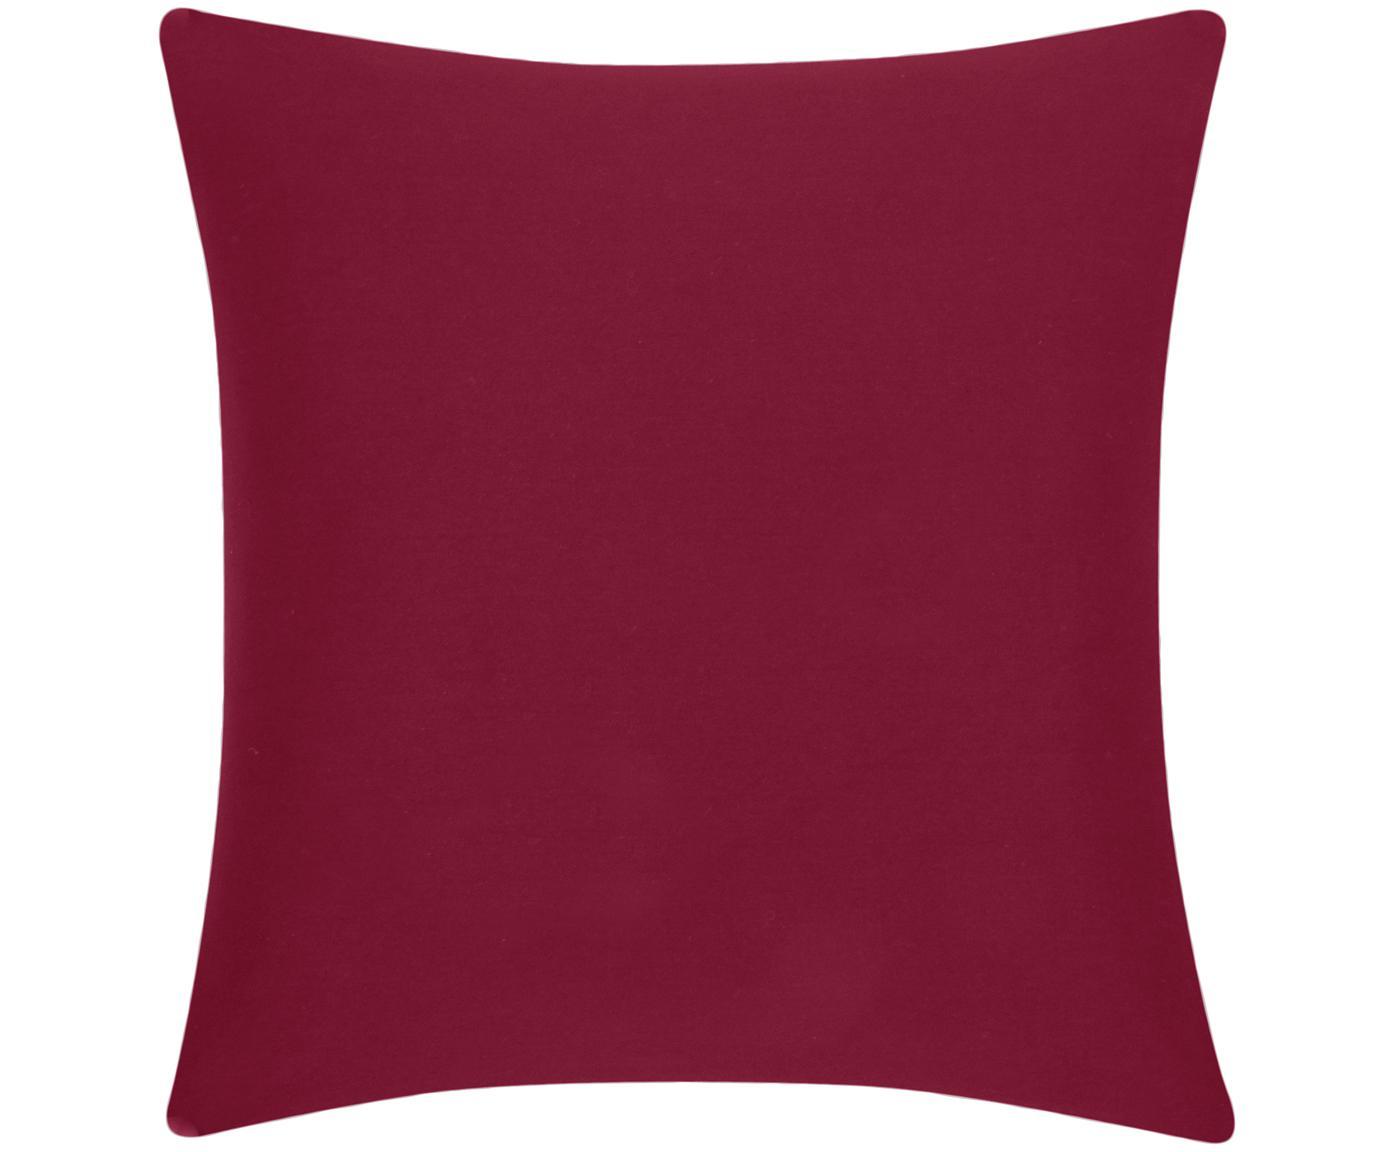 Baumwoll-Kissenhülle Mads in Rot, 100% Baumwolle, Rot, 50 x 50 cm